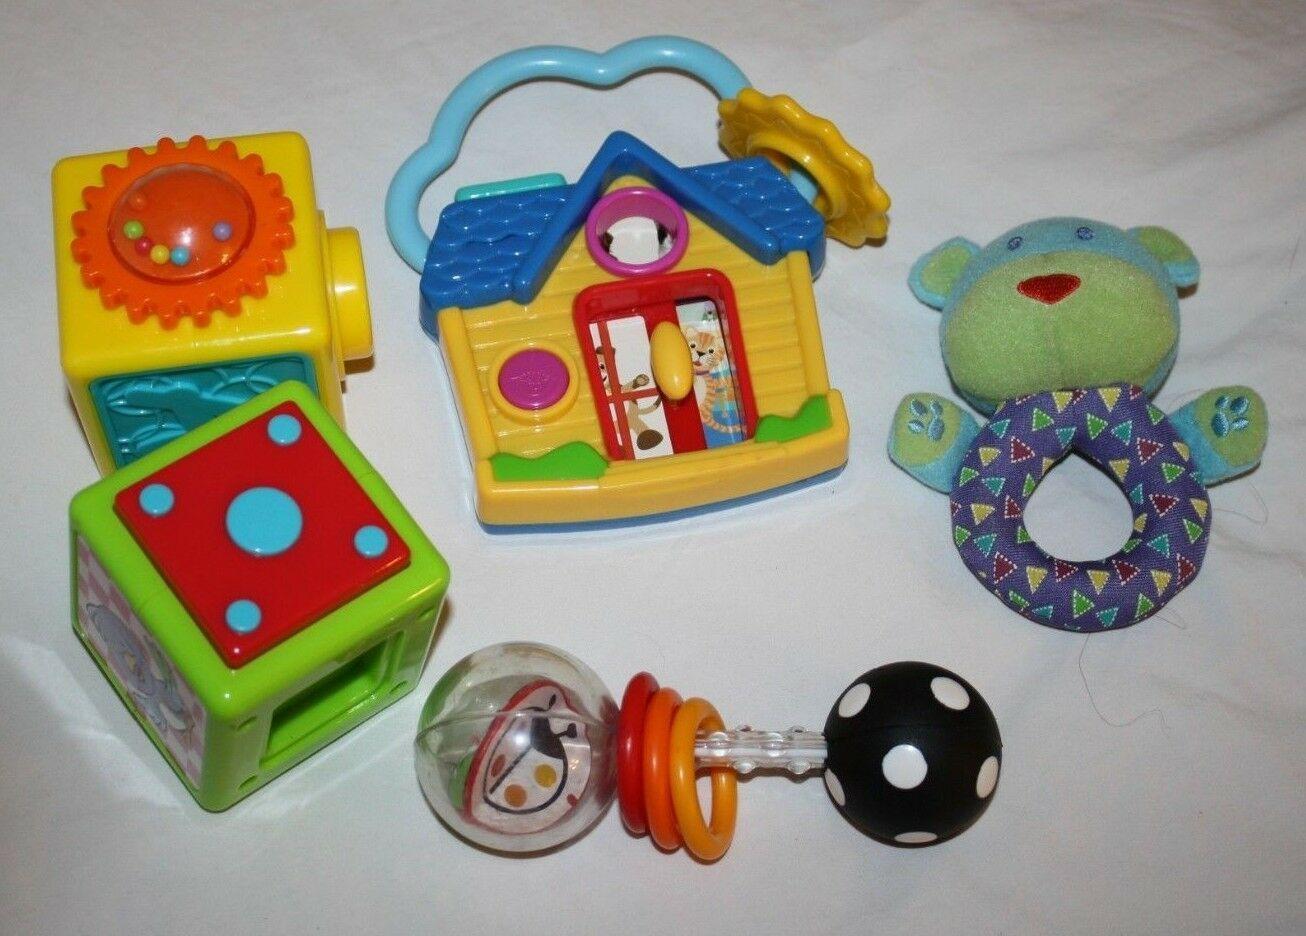 Baby Einstein House Hello Good Bye Spanish Sassy Spin Shine Rattle Lot Baby Toys - $13.52